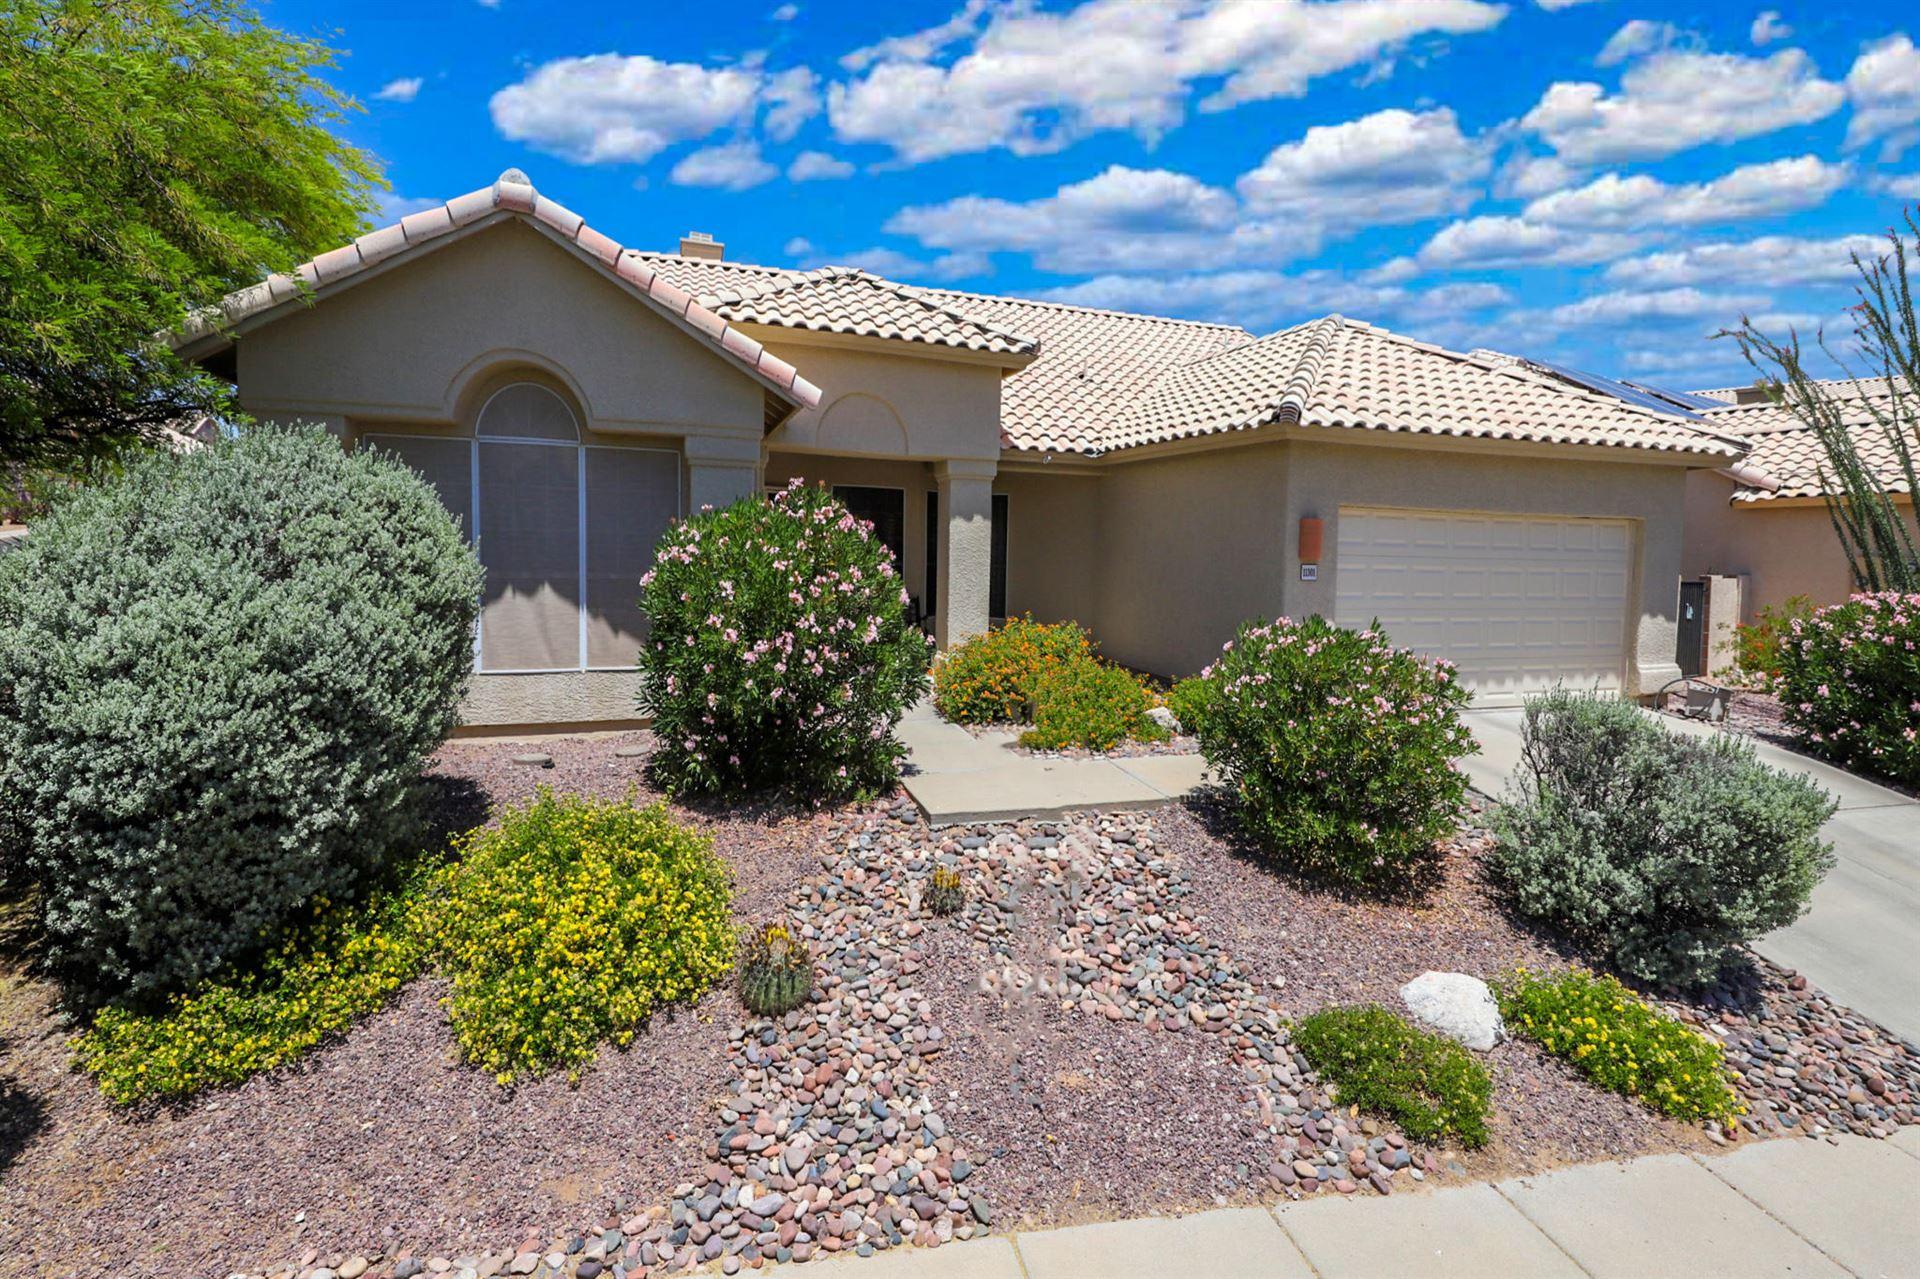 11301 Silver Pheasant Loop, Oro Valley, AZ 85737 - MLS#: 22112443